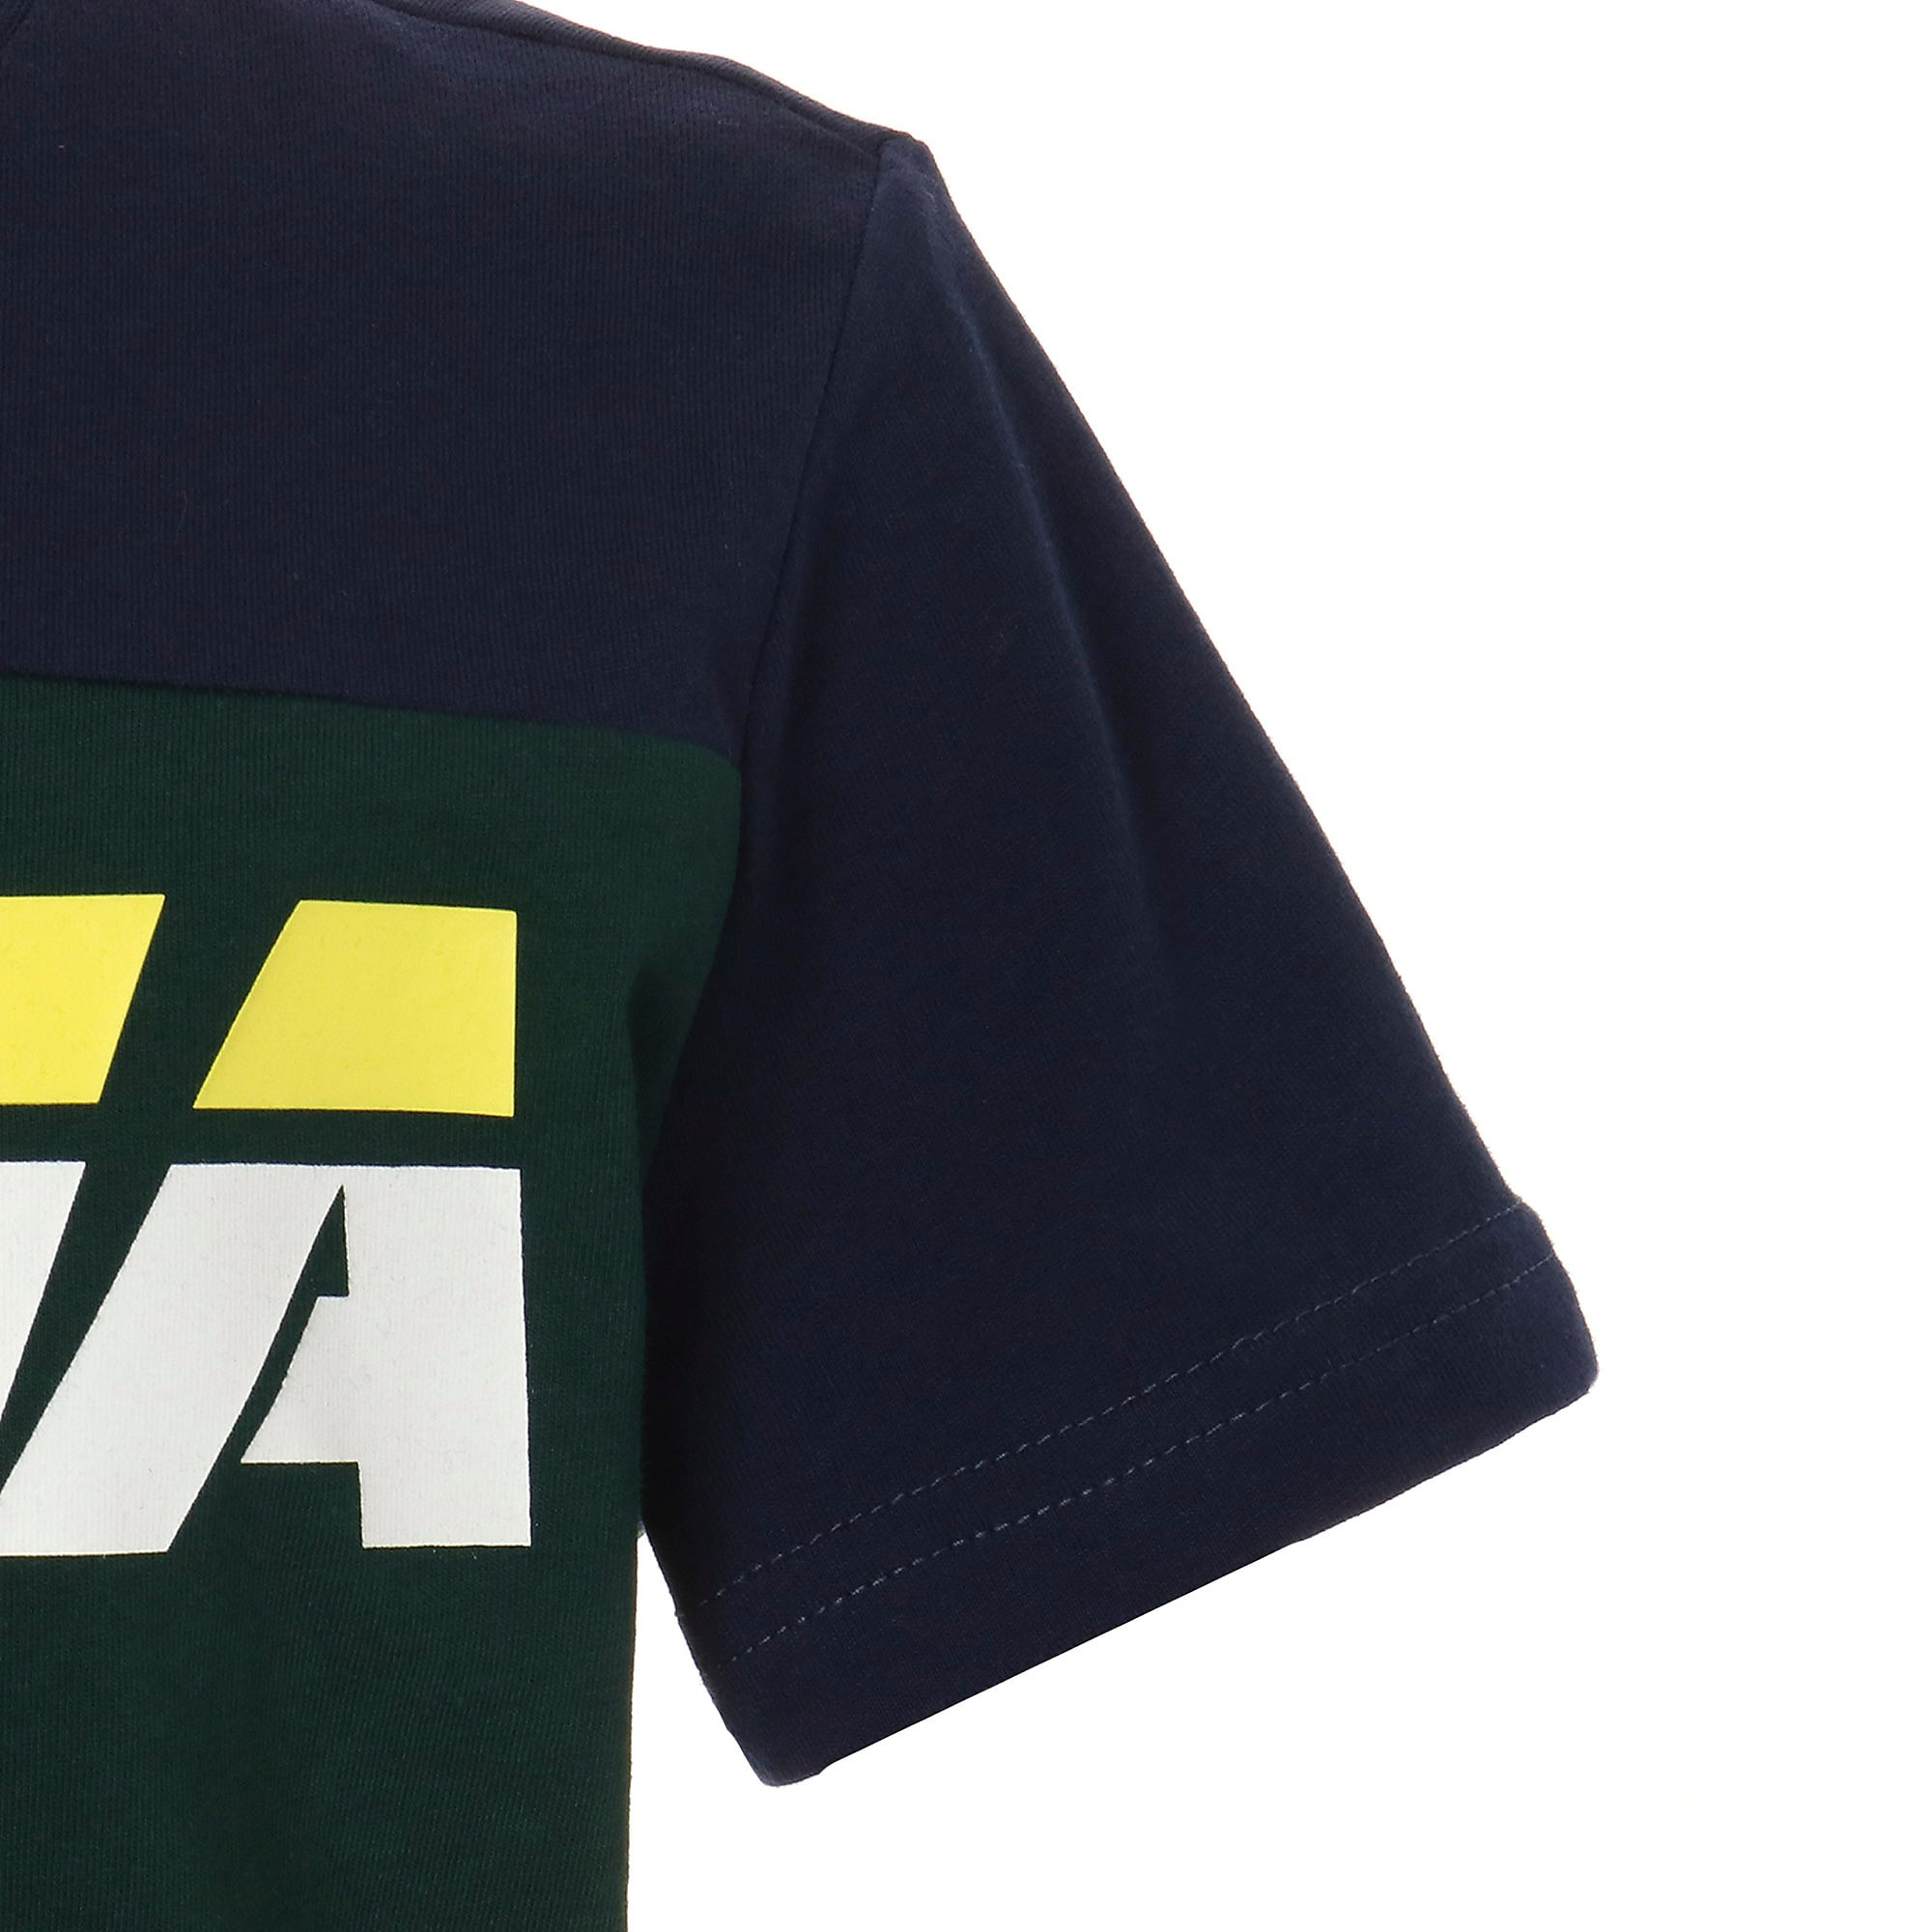 Thumbnail 5 of キッズ ALPHA SS トレンド Tシャツ 半袖, Ponderosa Pine, medium-JPN